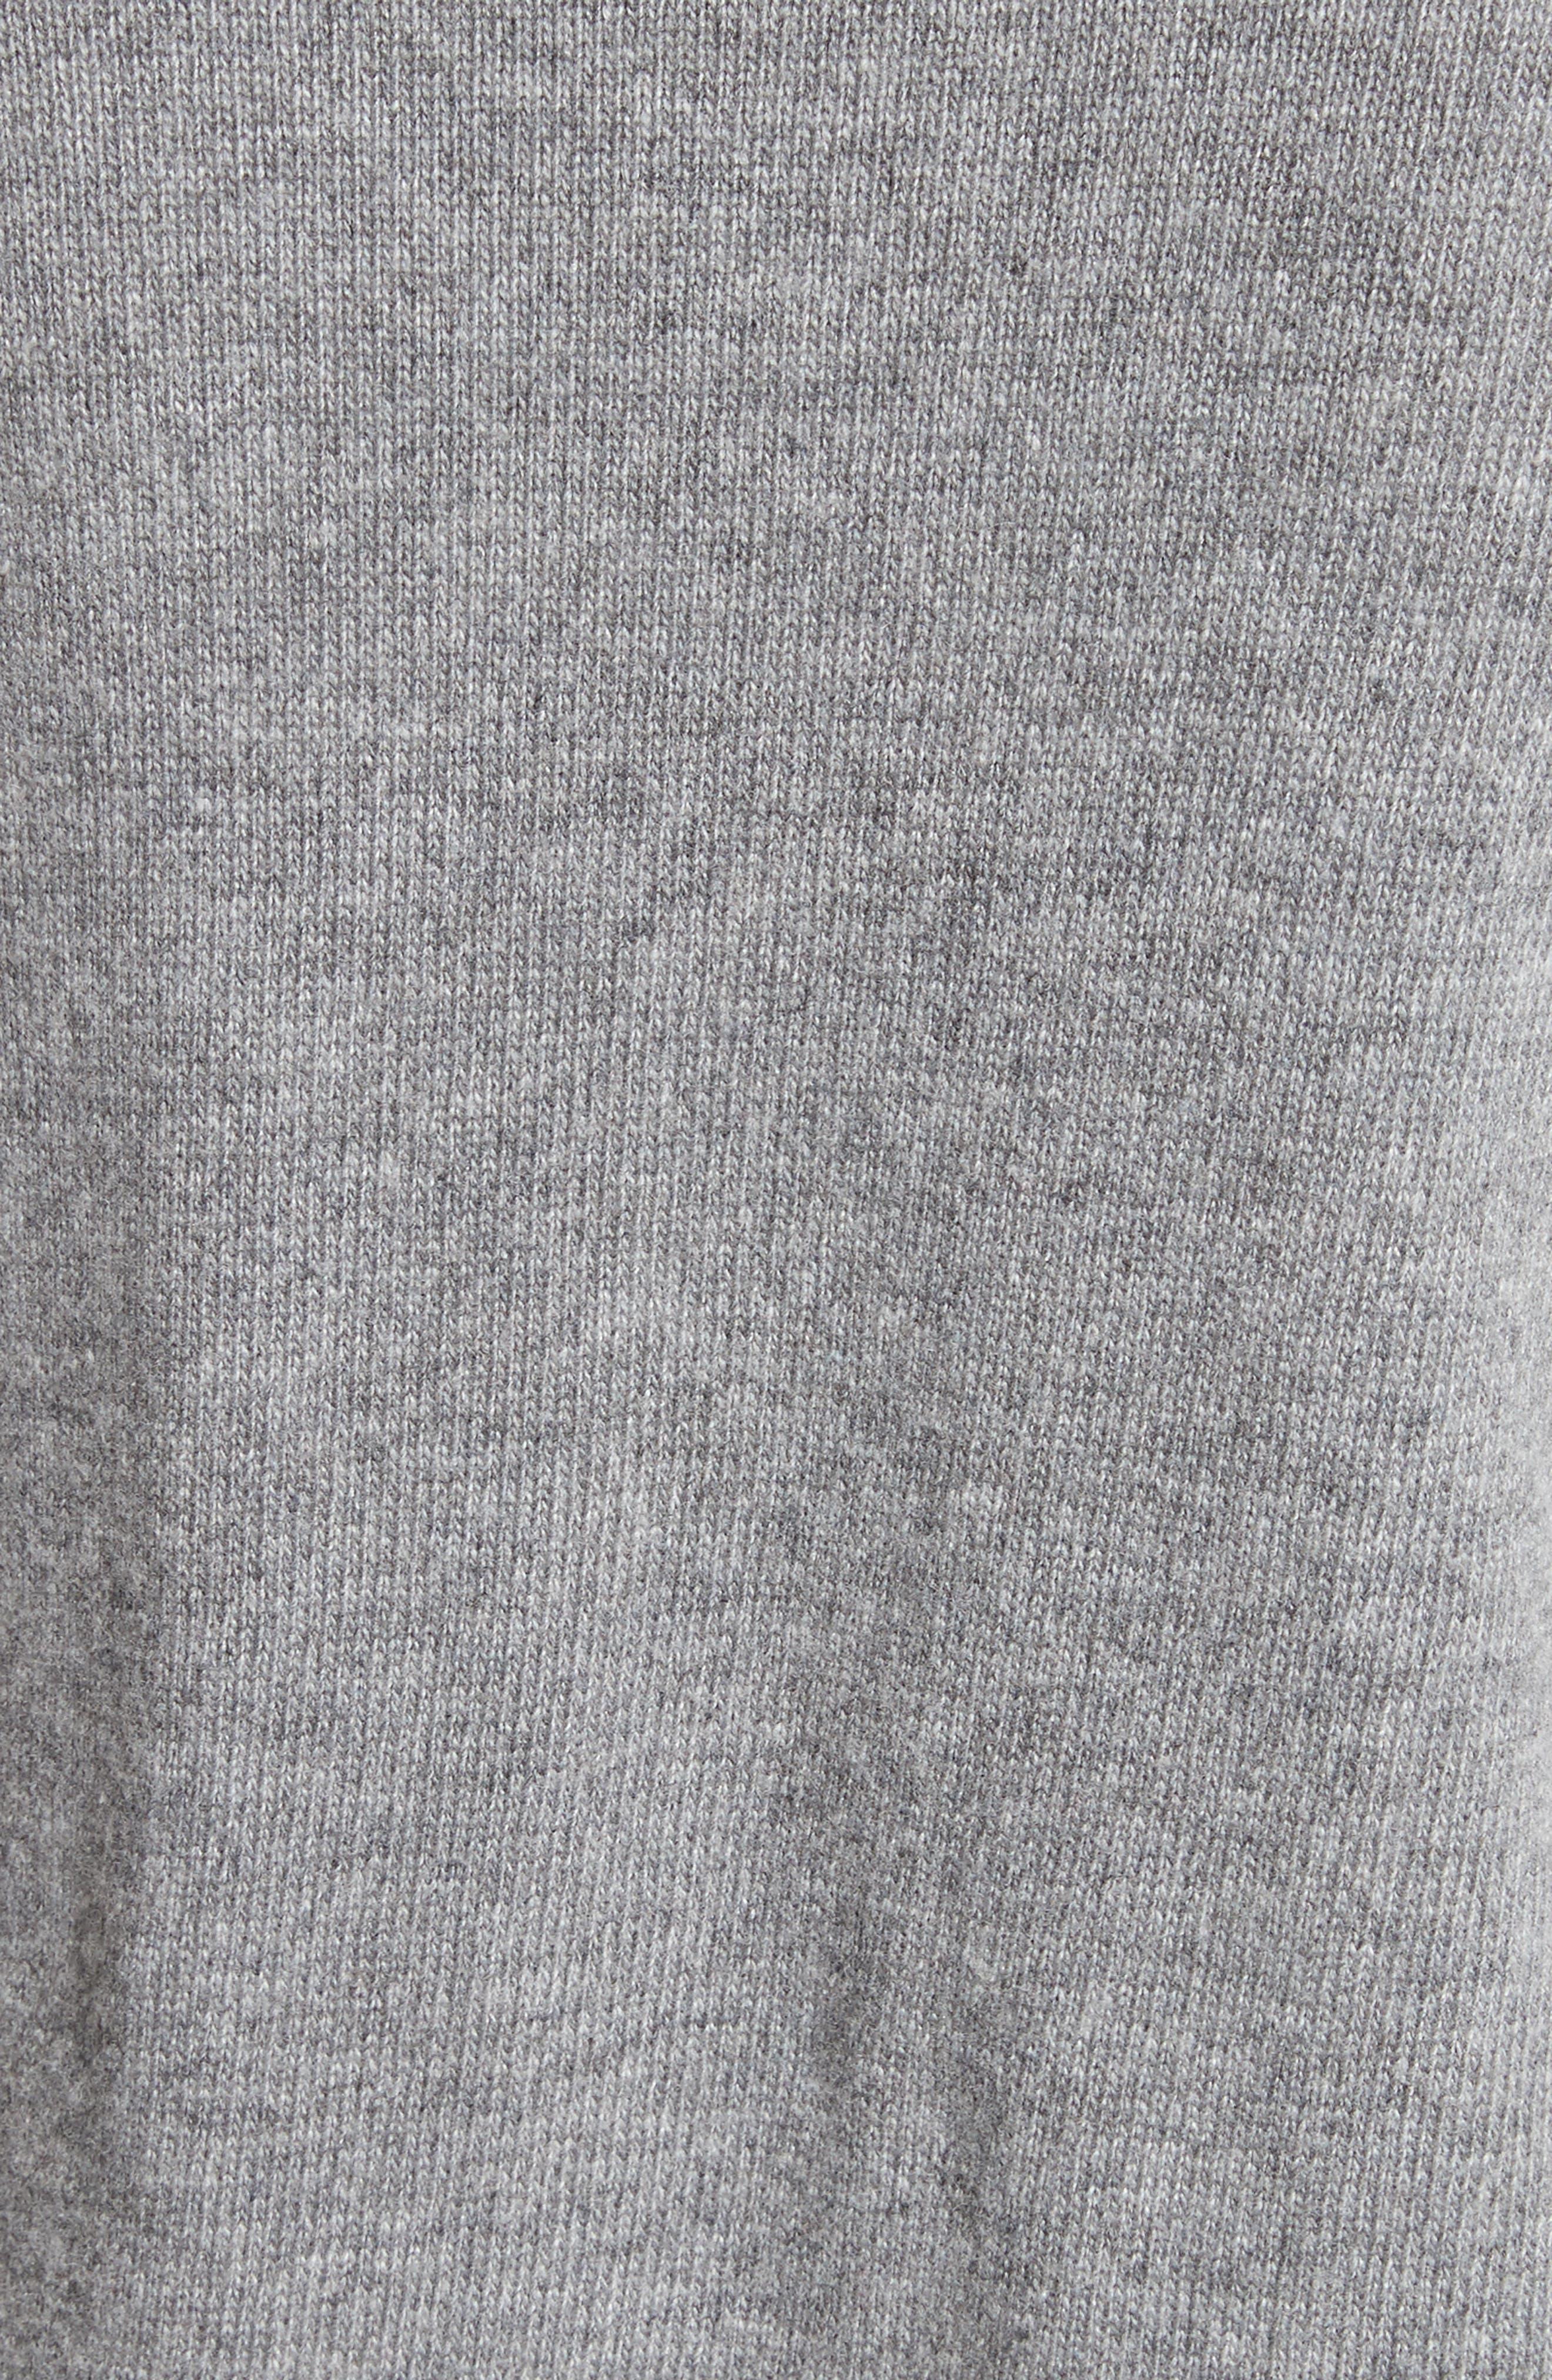 Rei Argyle Crewneck Sweater,                             Alternate thumbnail 5, color,                             077